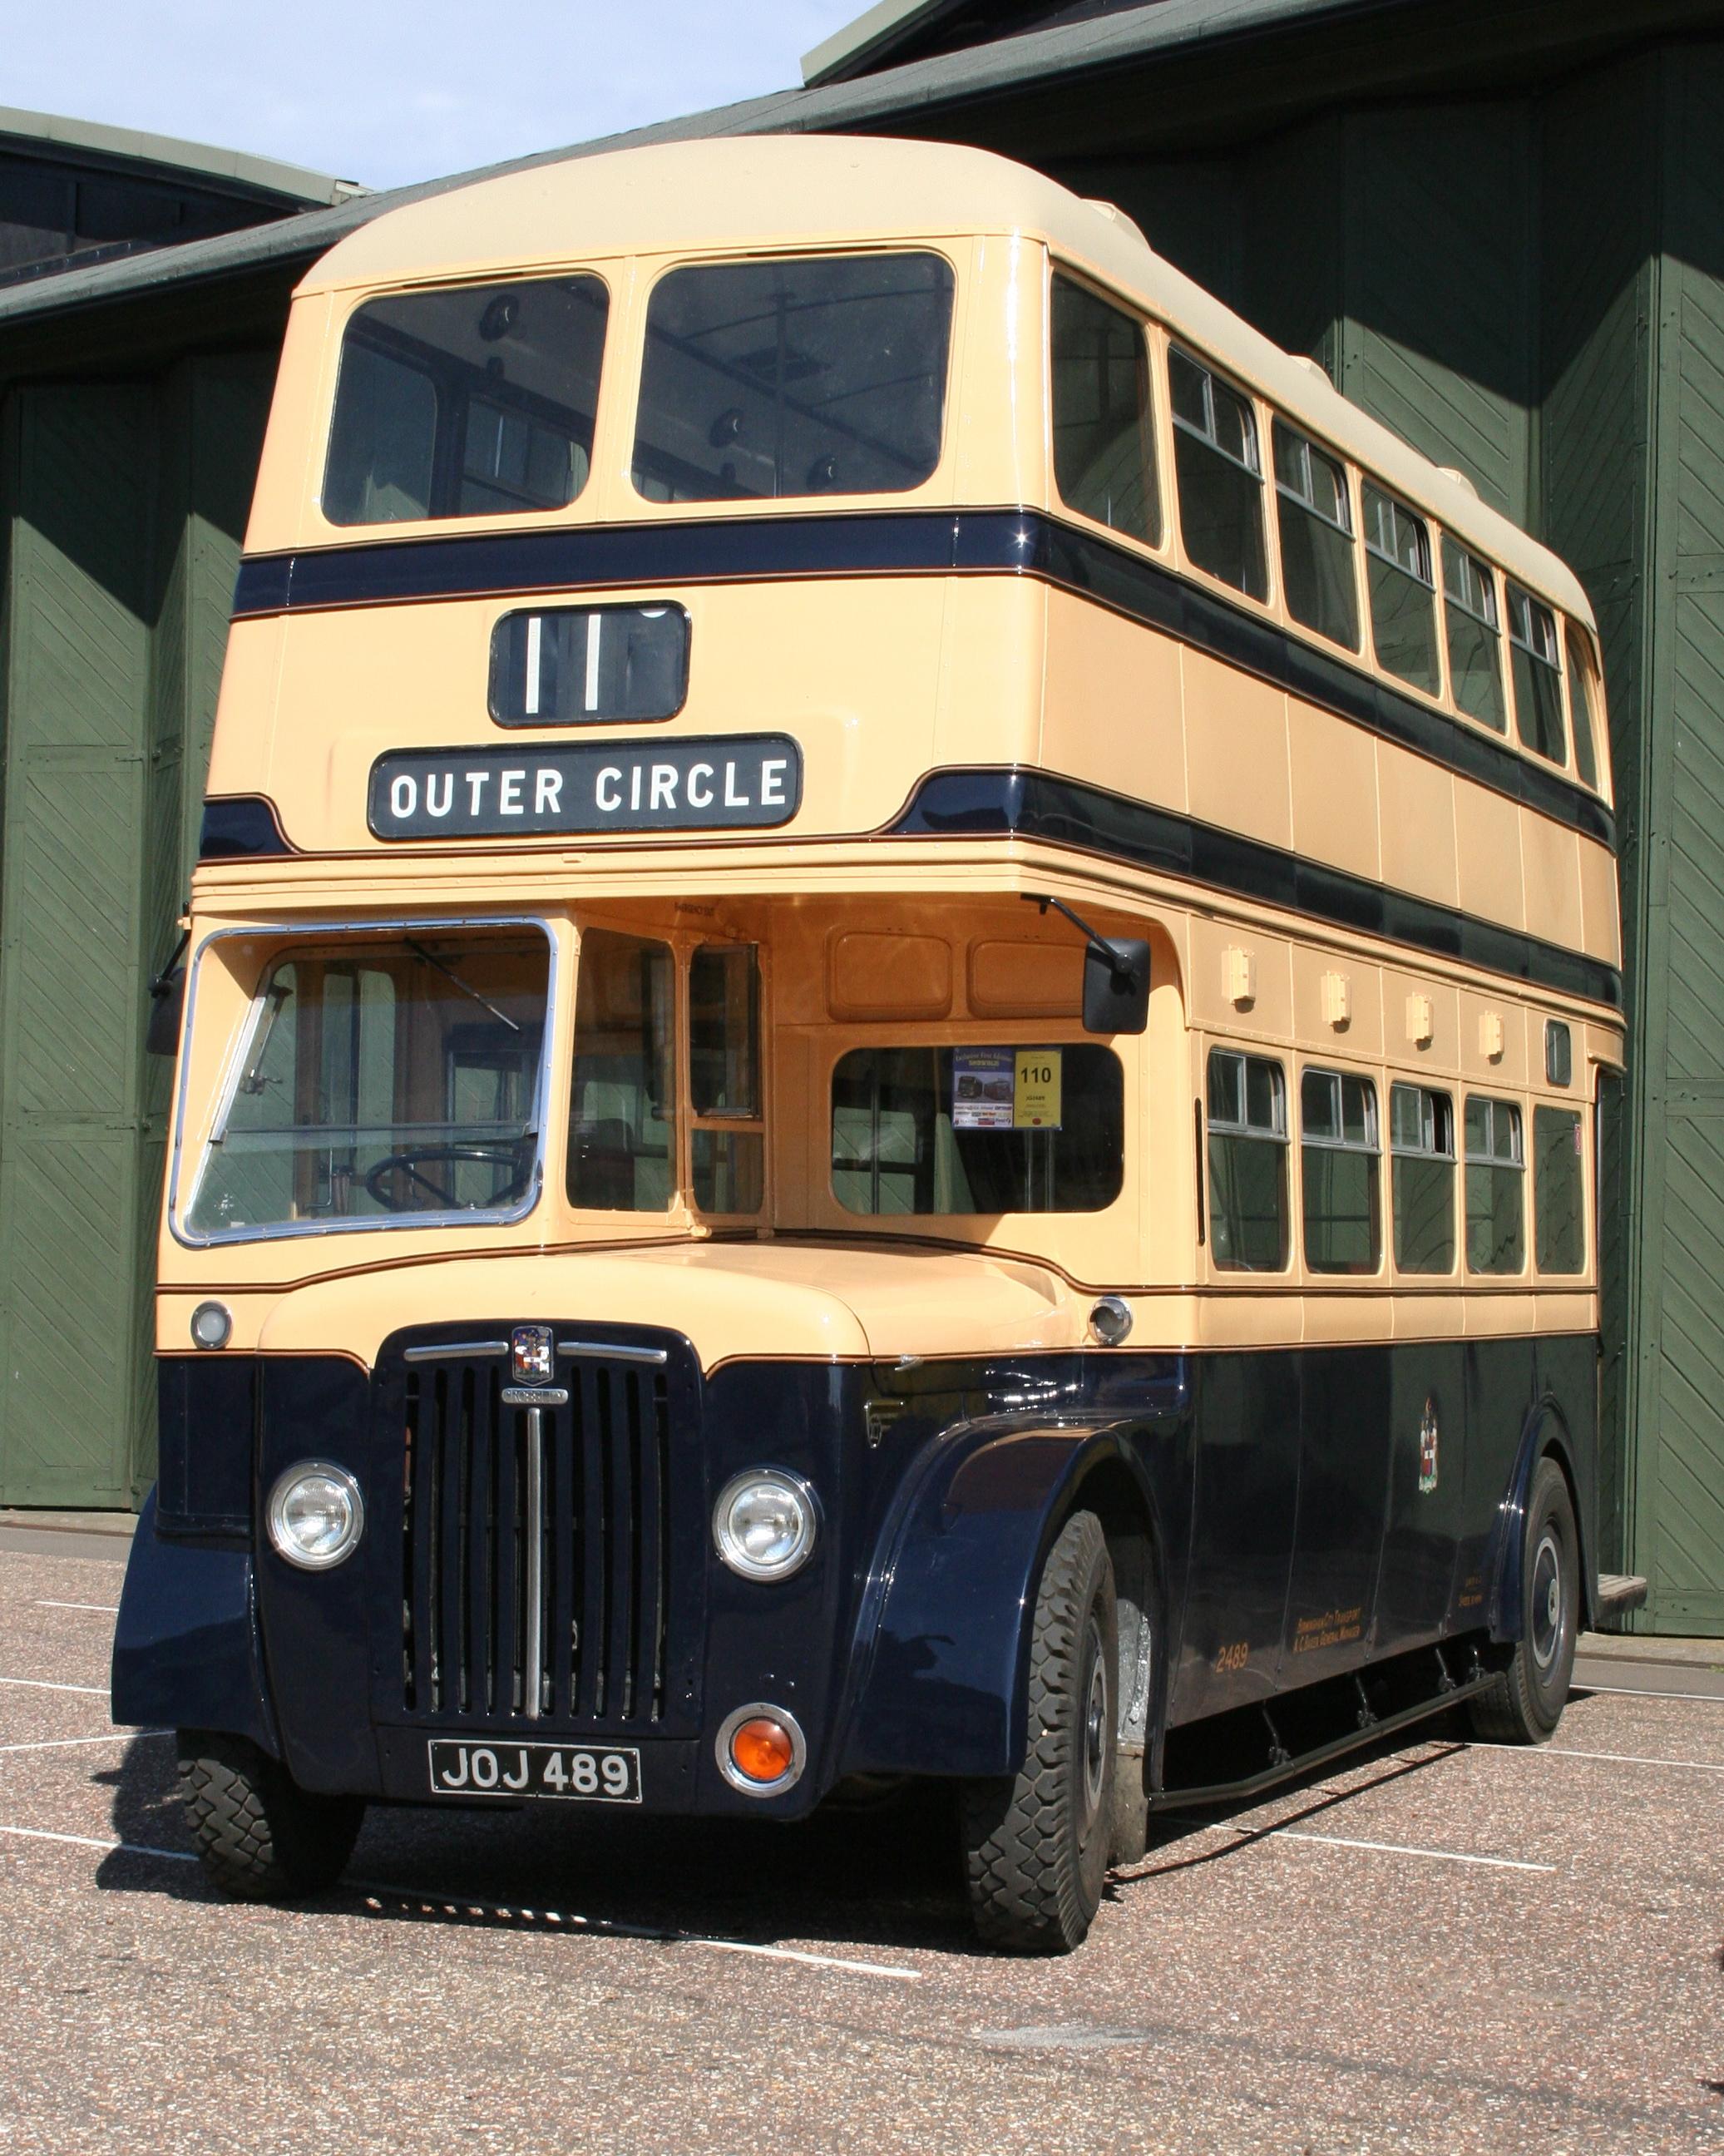 File:Birmingham City Transport bus 2489 (JOJ 489), Showbus 2007.jpg